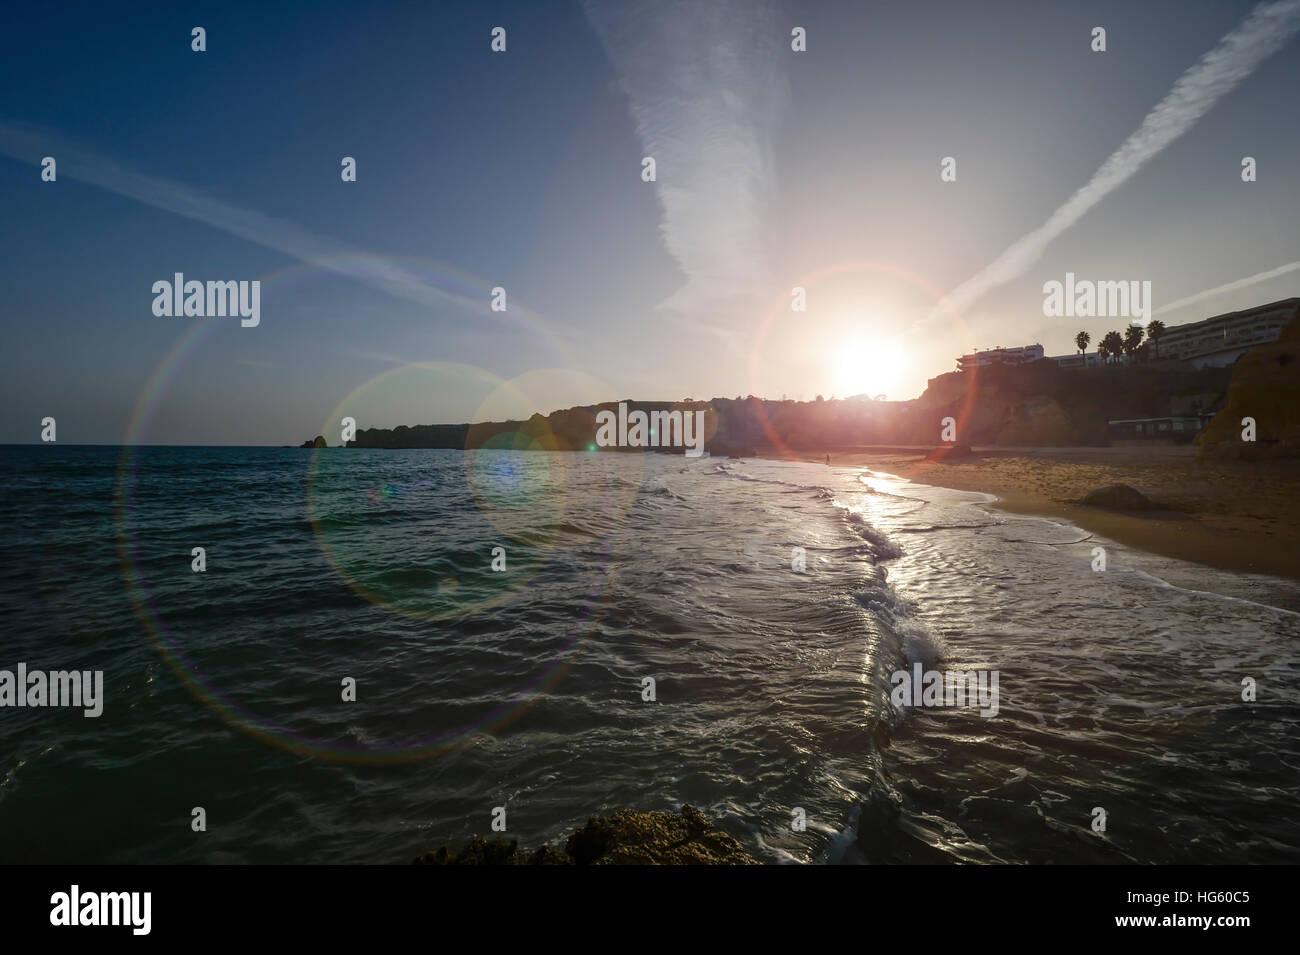 sunsetting at Dona Ana beach Lagos Portugal - Stock Image